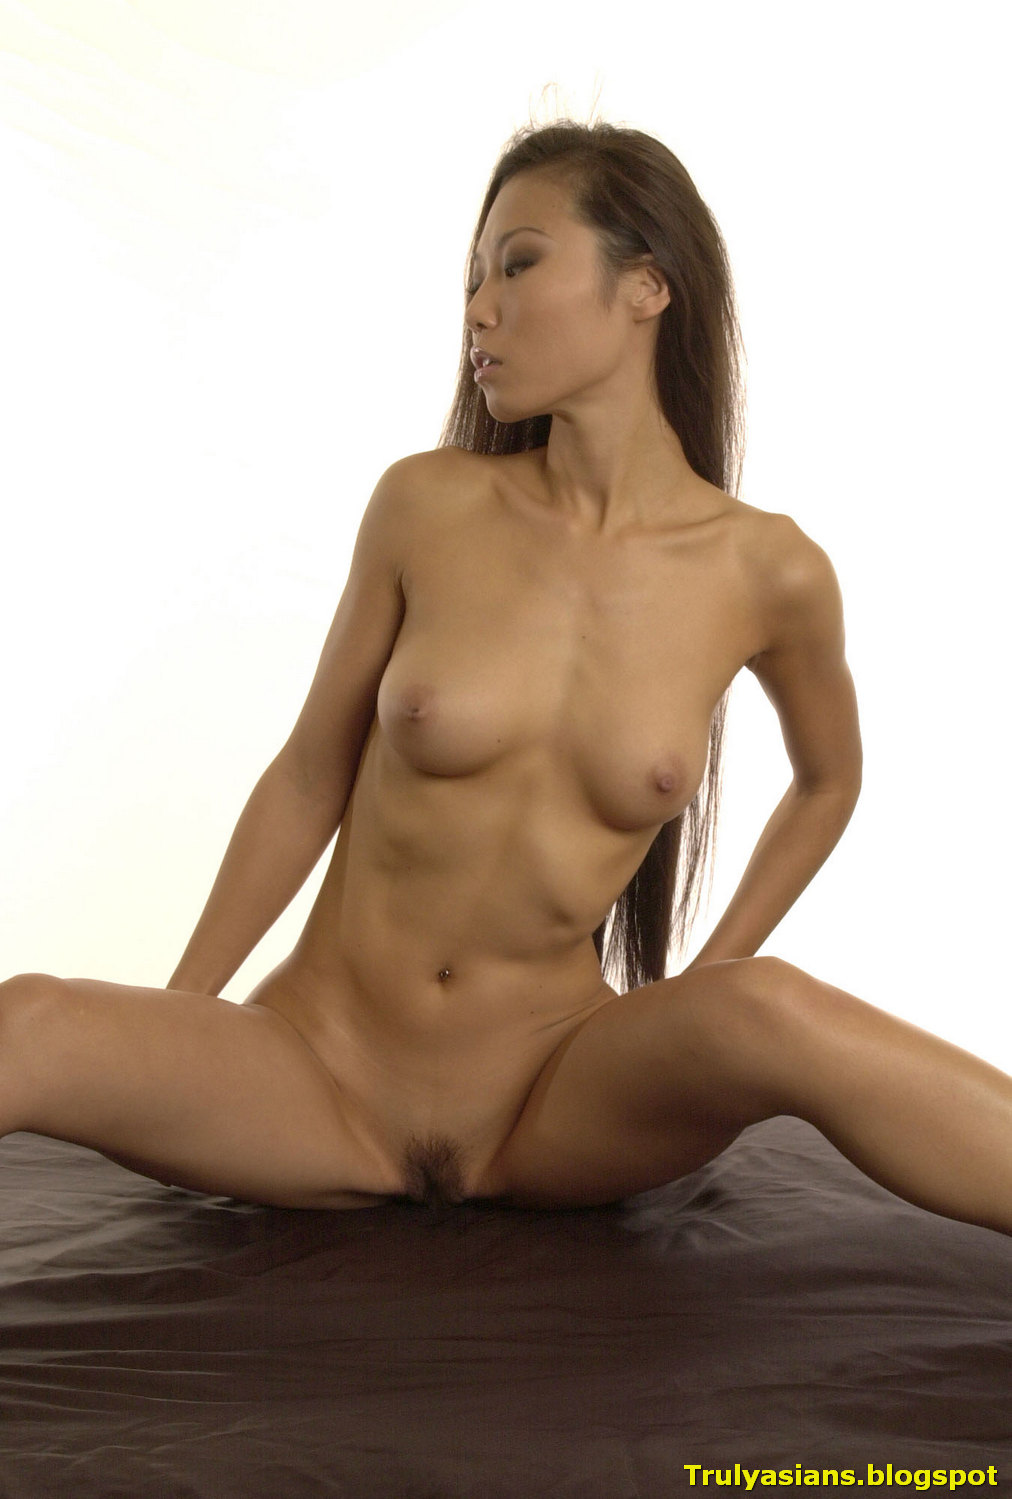 Truly Asians Asian Model Yuki Nude Photo Shoot C 63 Pics-5412